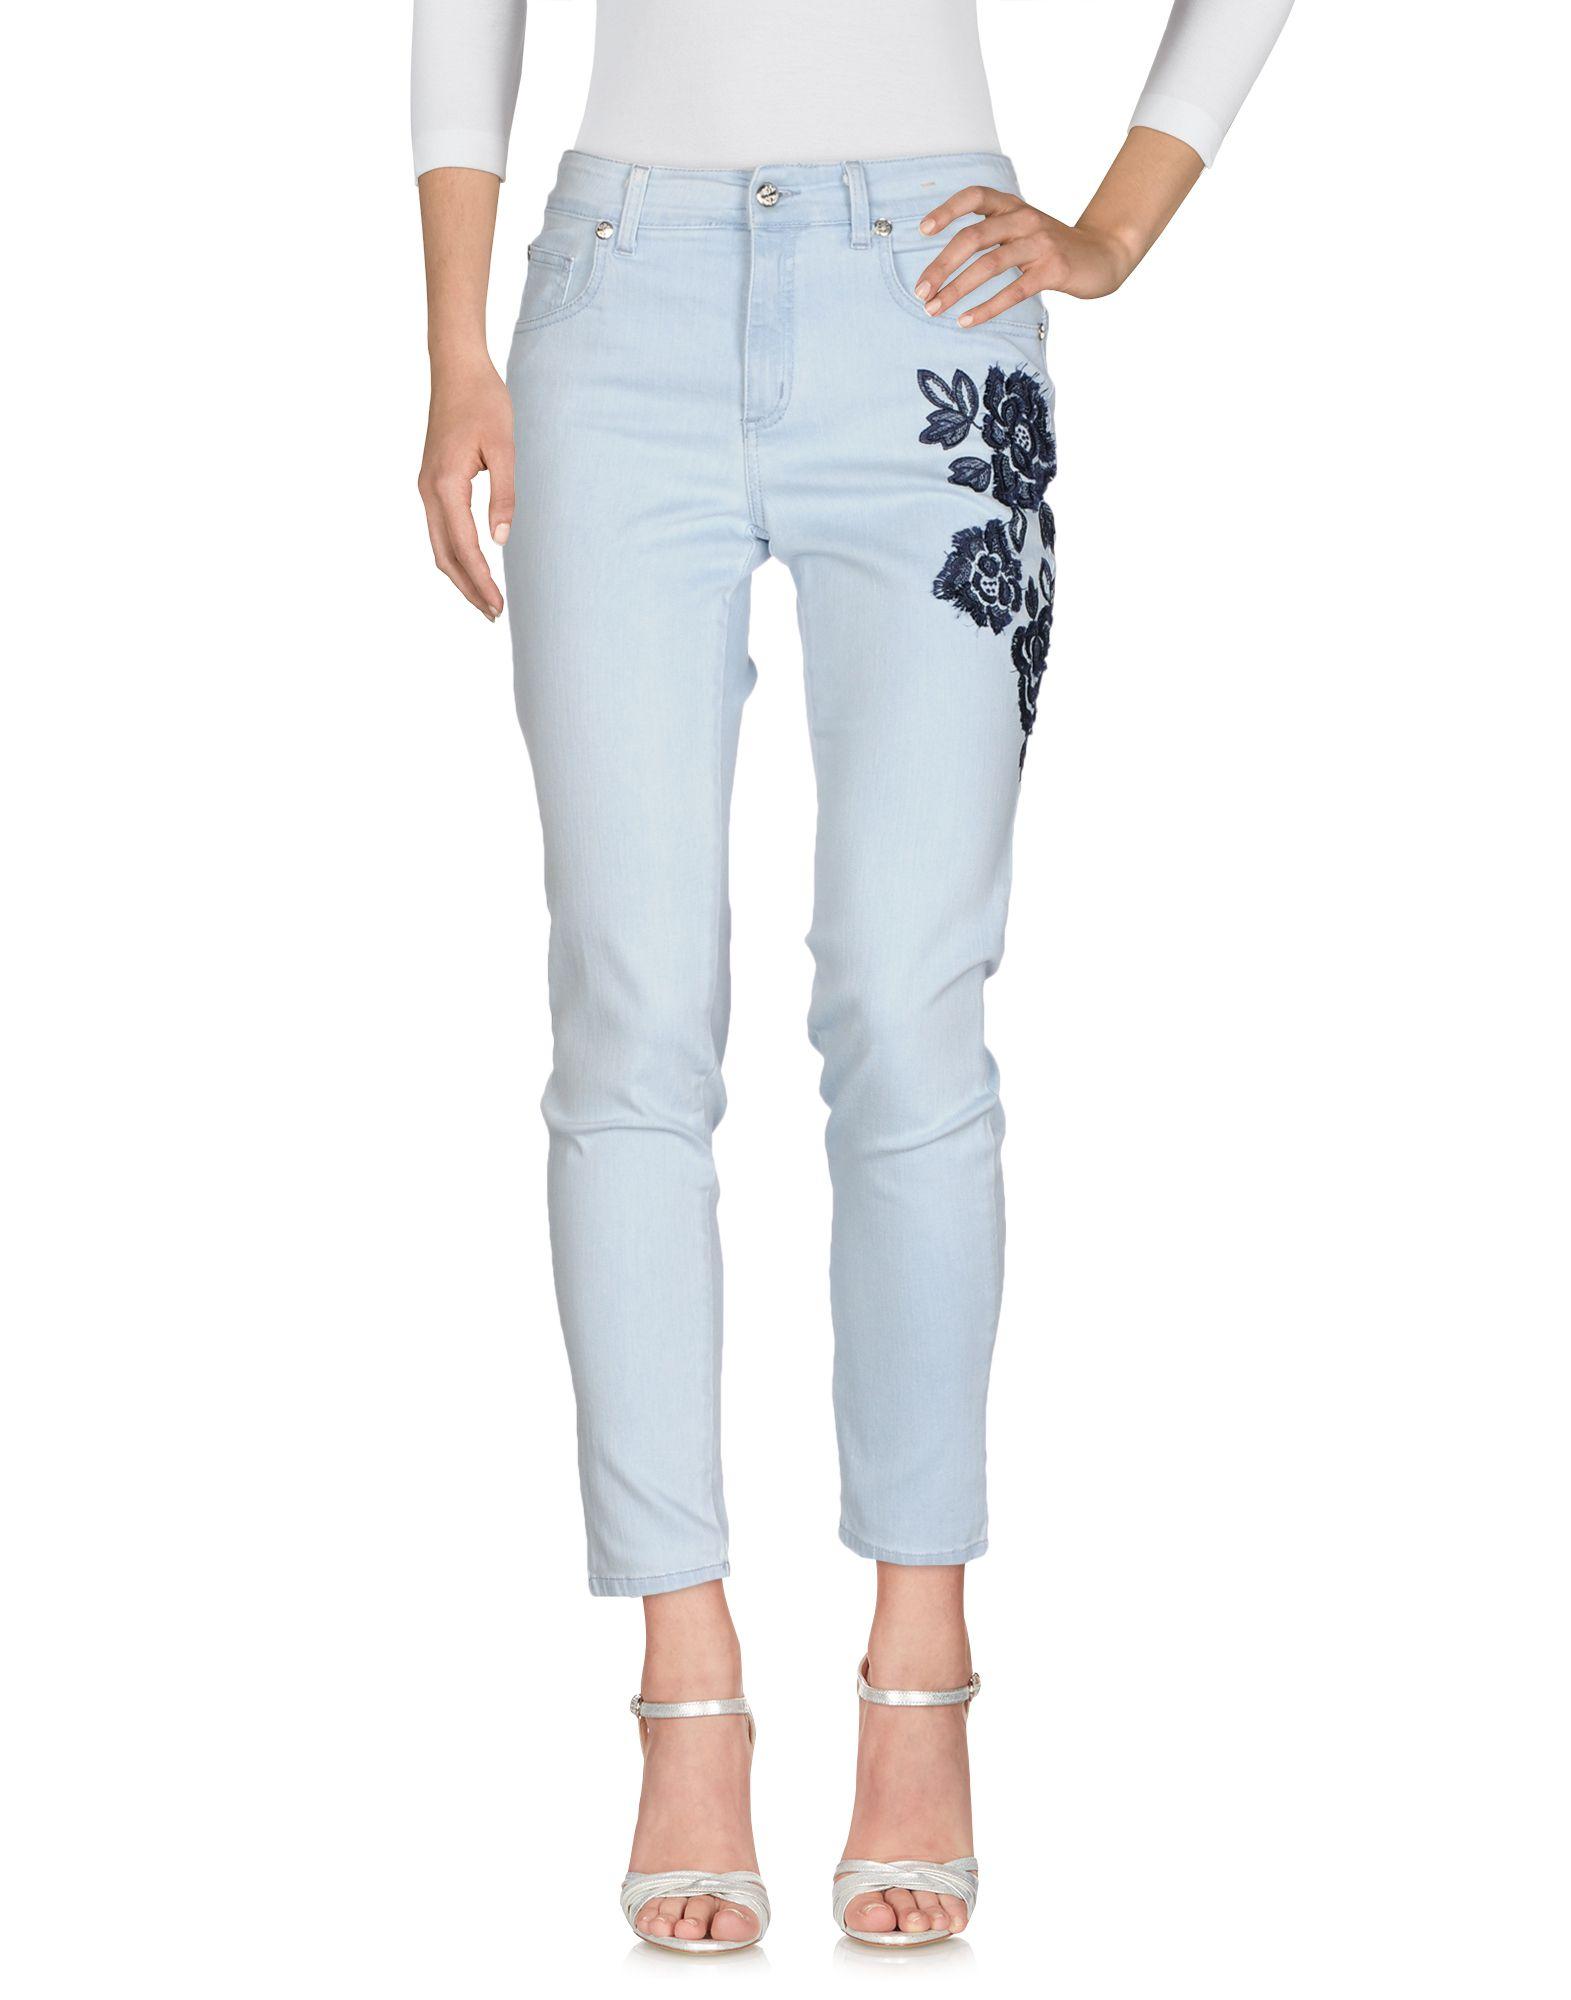 Pantaloni Jeans Marani Jeans Donna - Acquista online su nhvbk